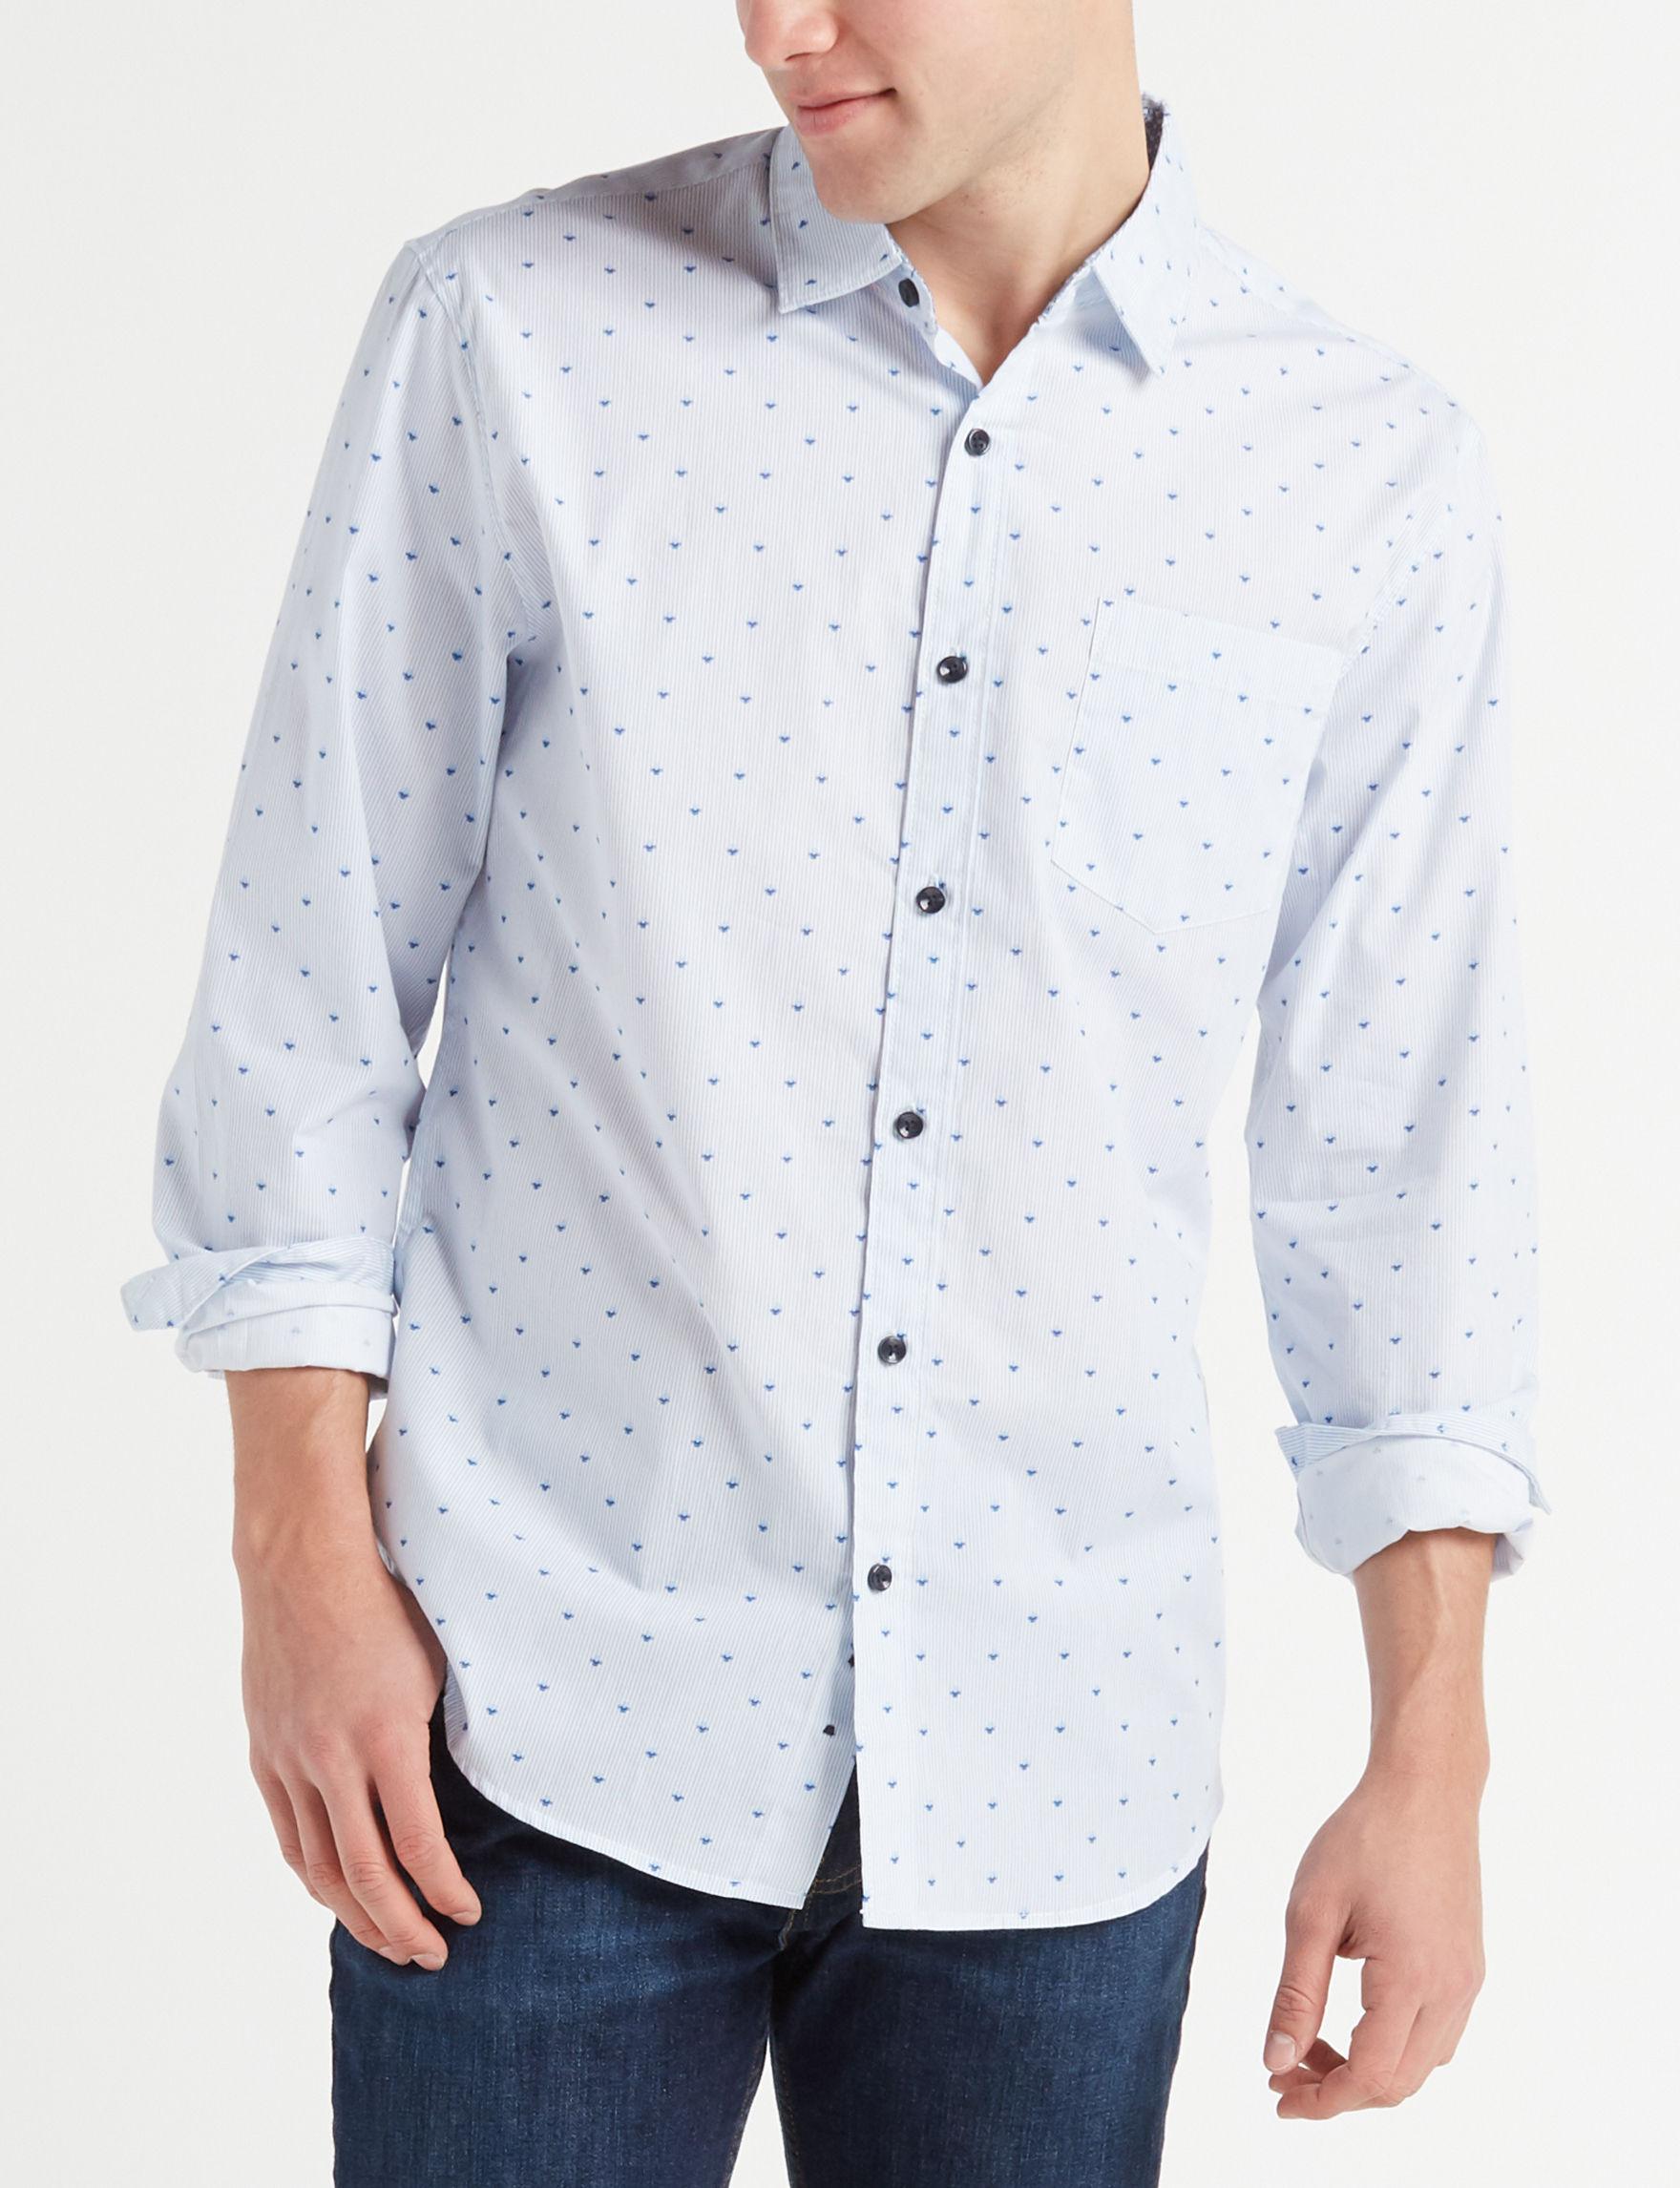 Signature Studio White / Navy Casual Button Down Shirts